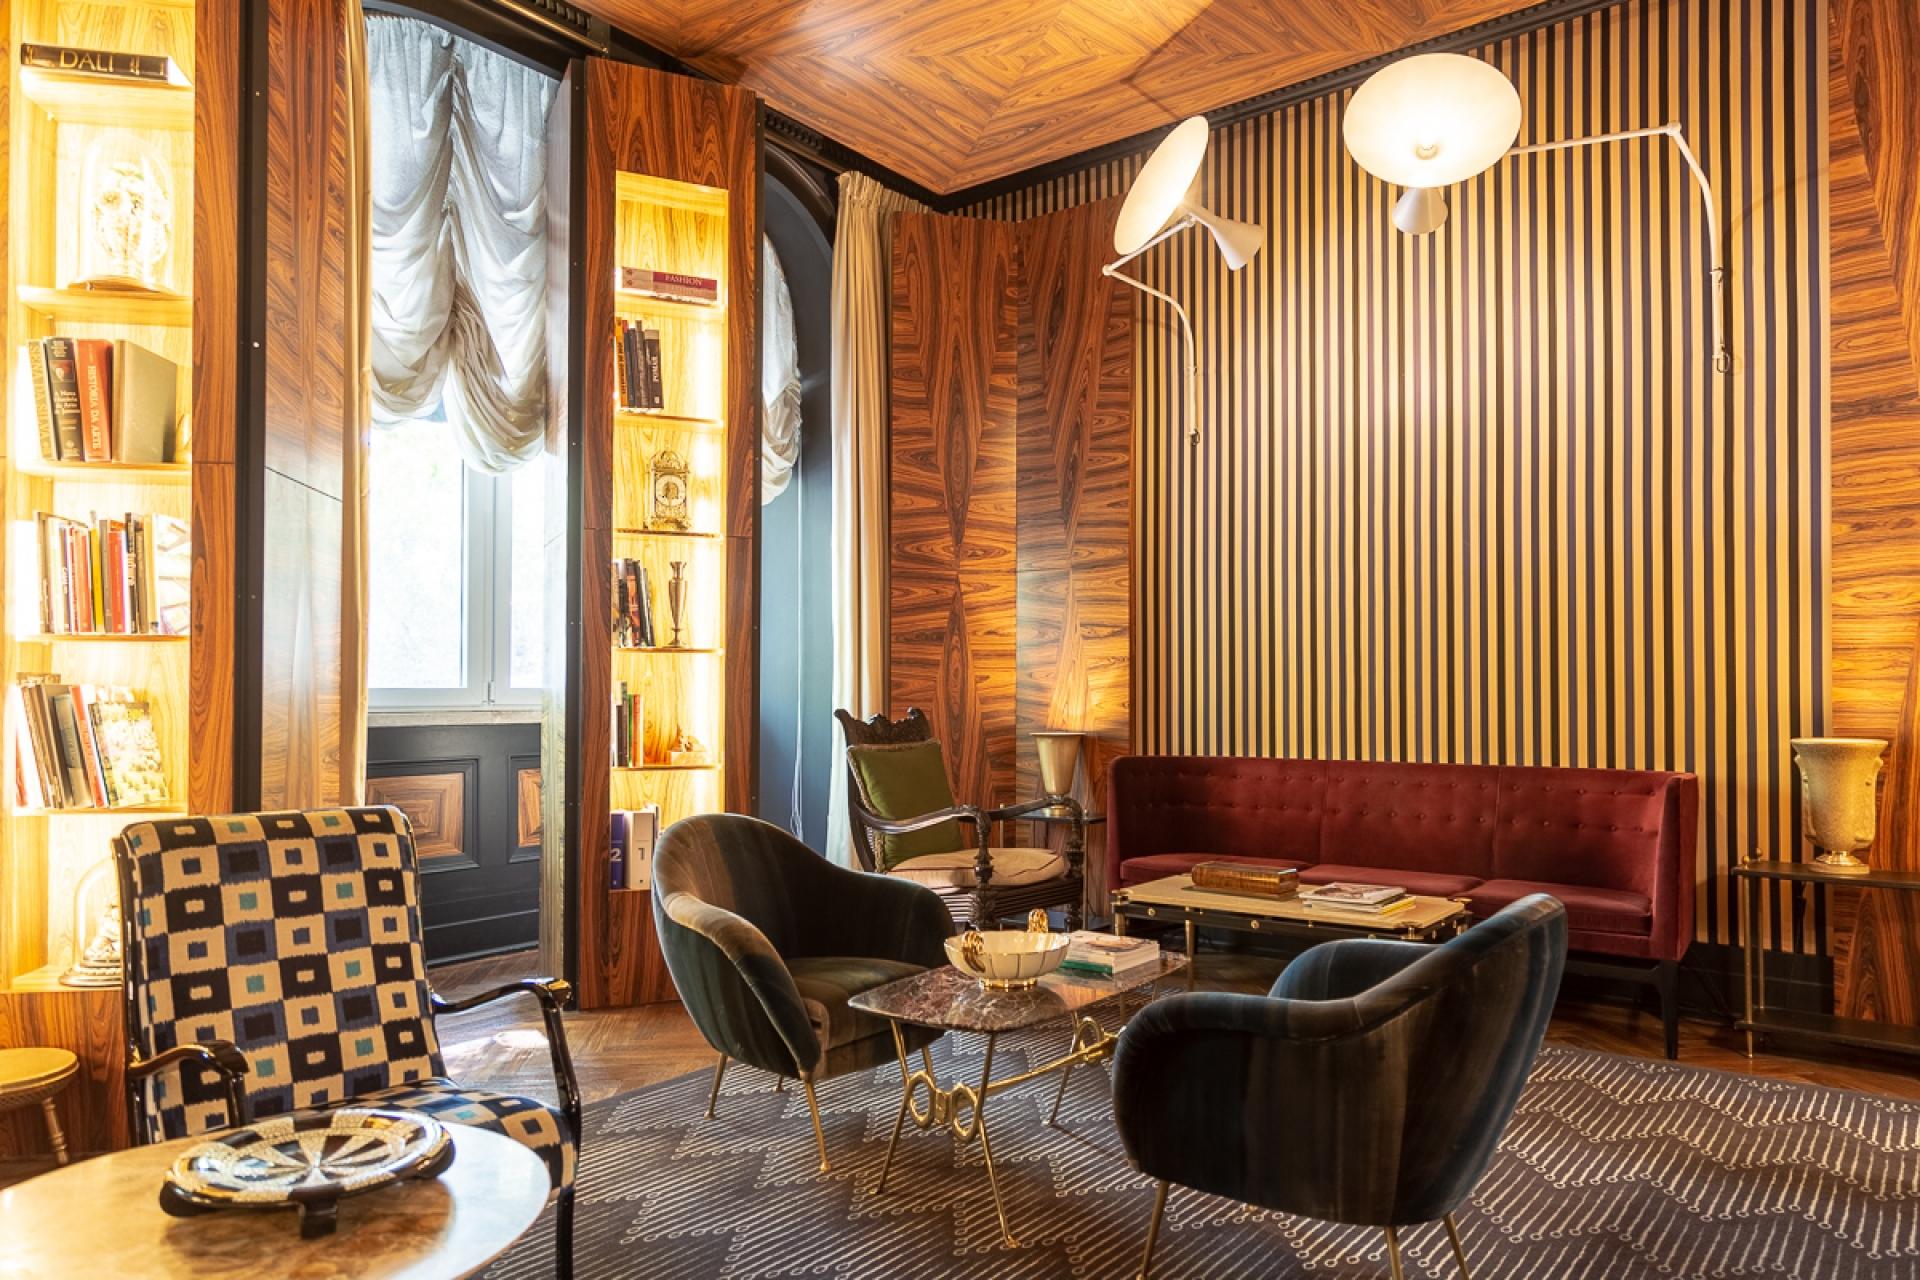 LisboaCool_Sleep_Hotel_Valverde